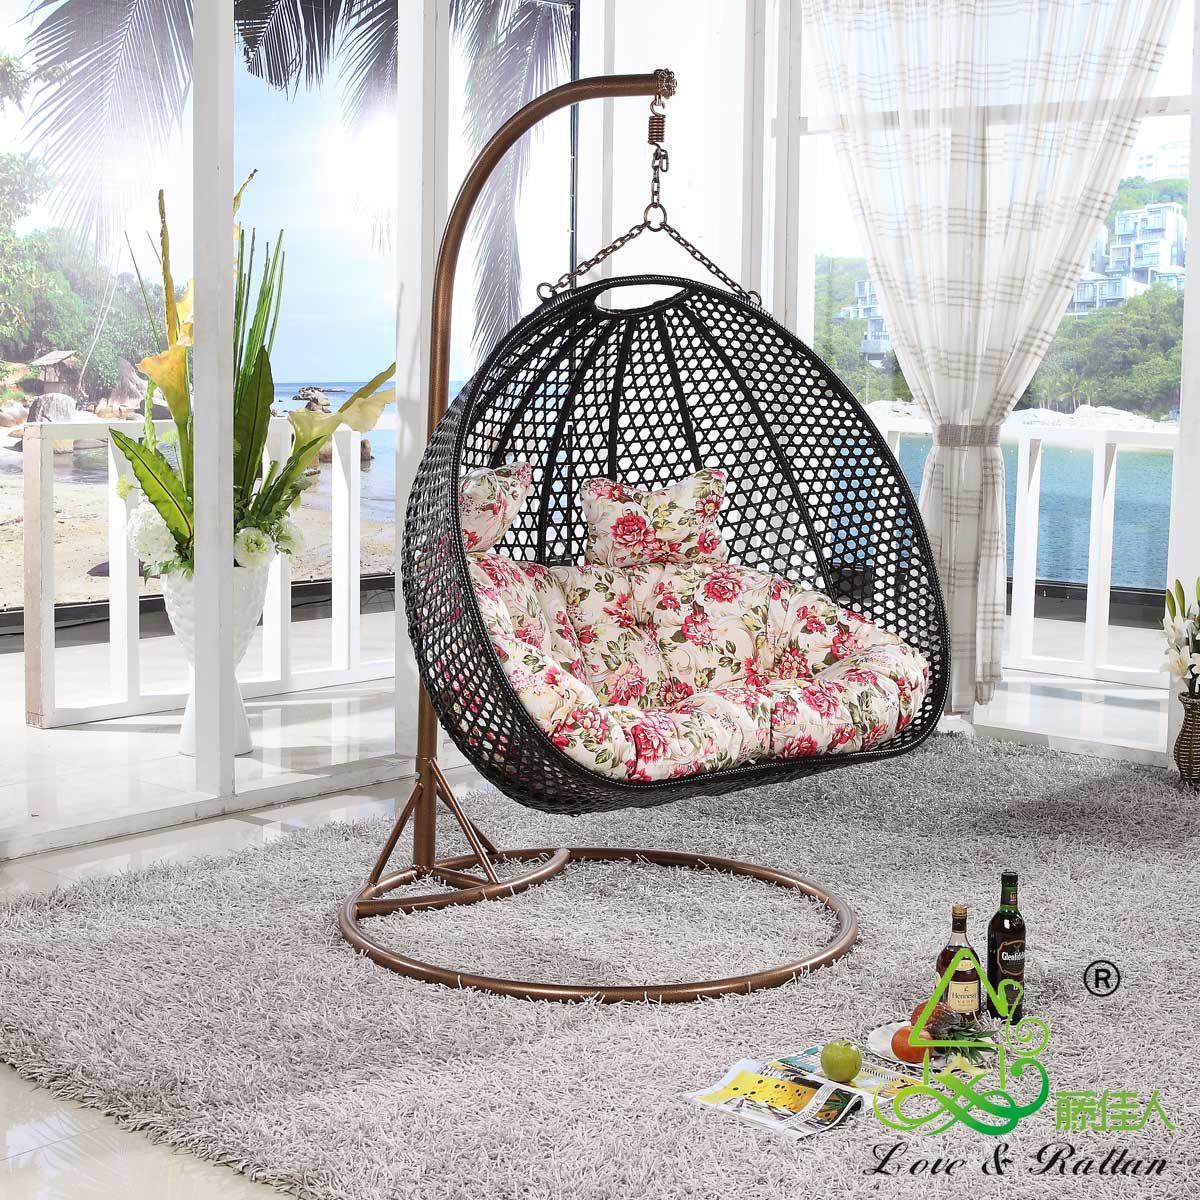 Furniture Rattan Chair Outdoor Swing Hanging Basket